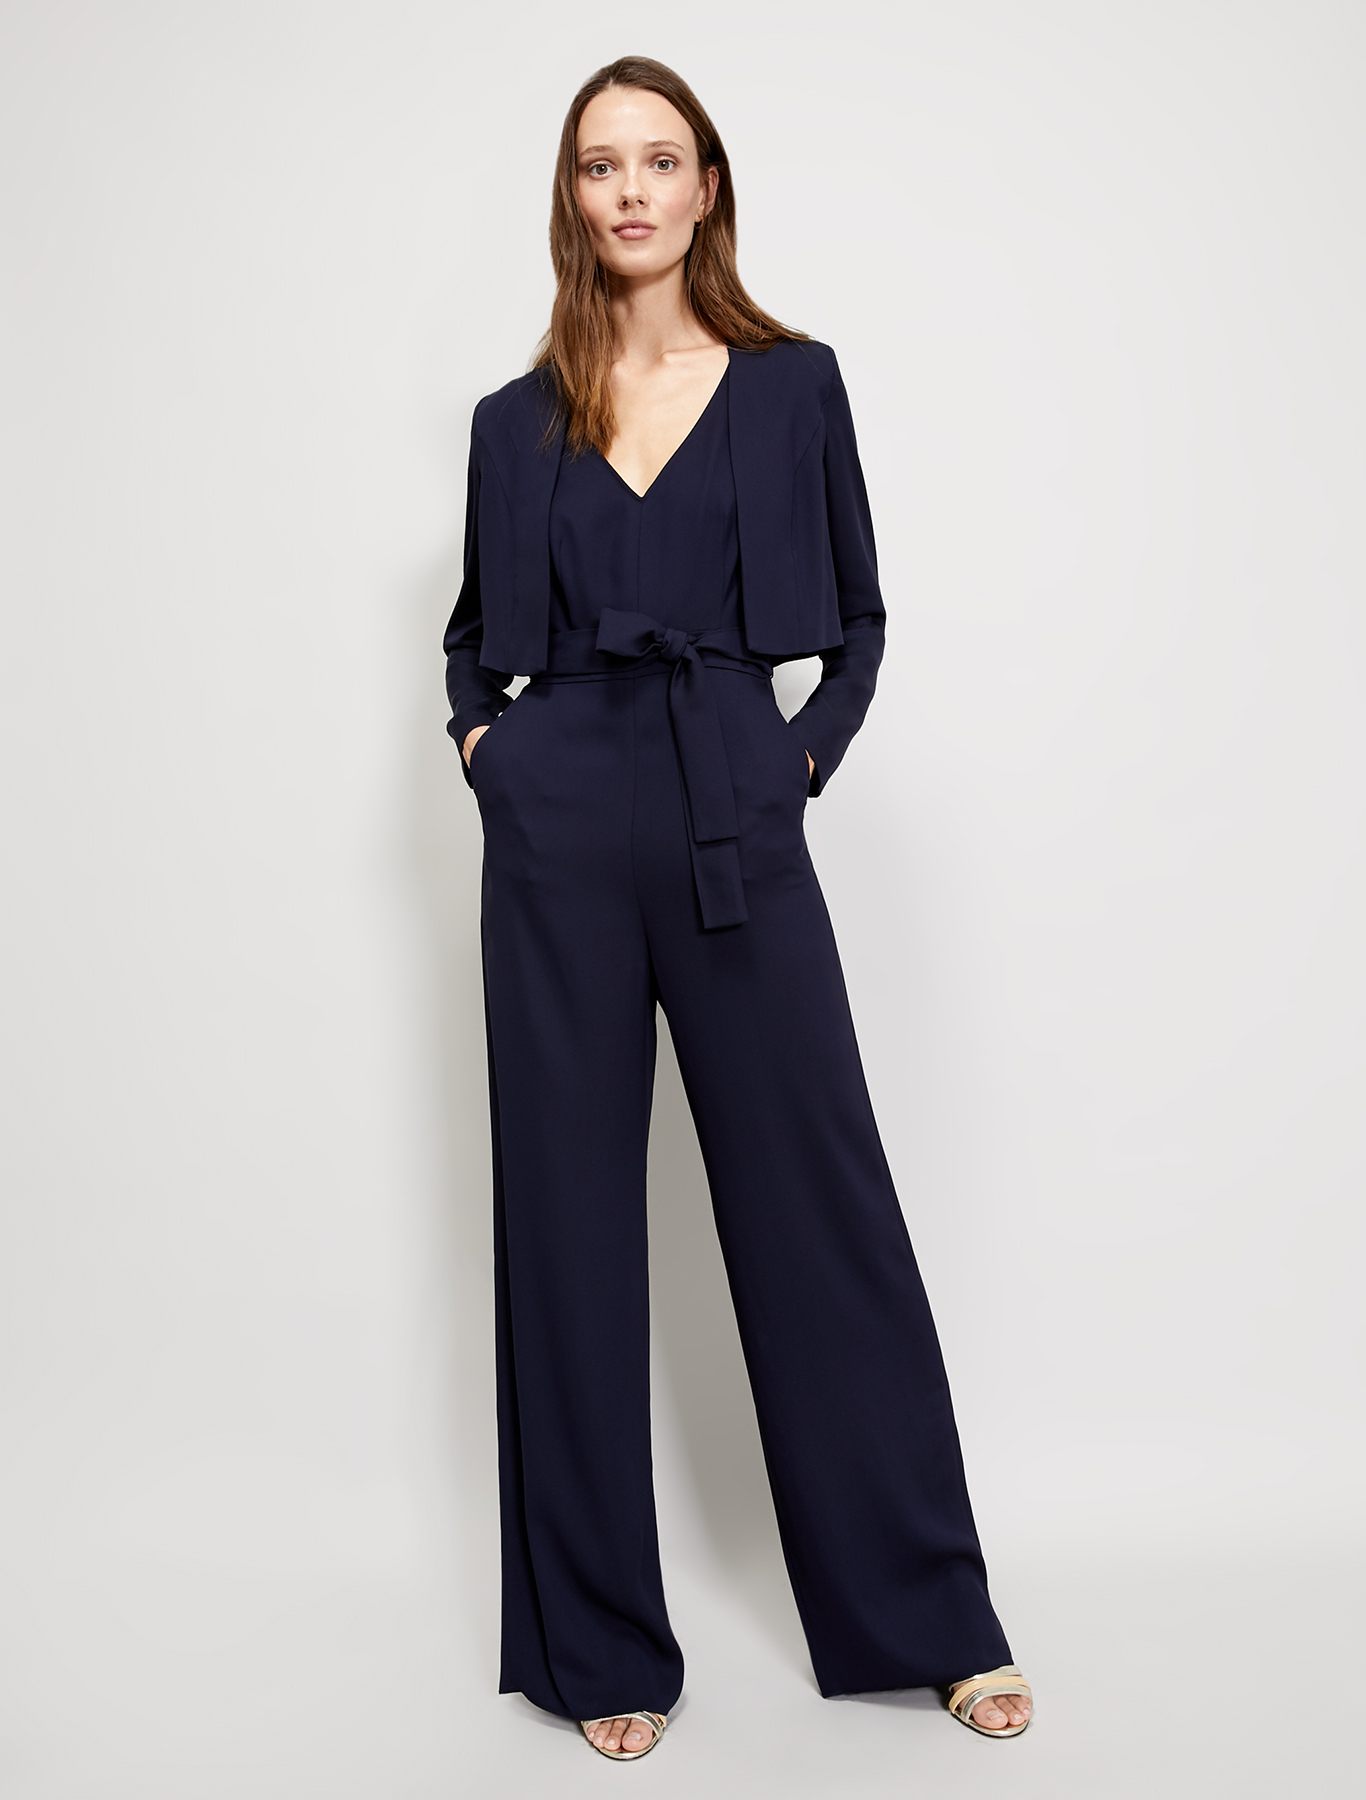 Cady bolero jacket - navy blue - pennyblack